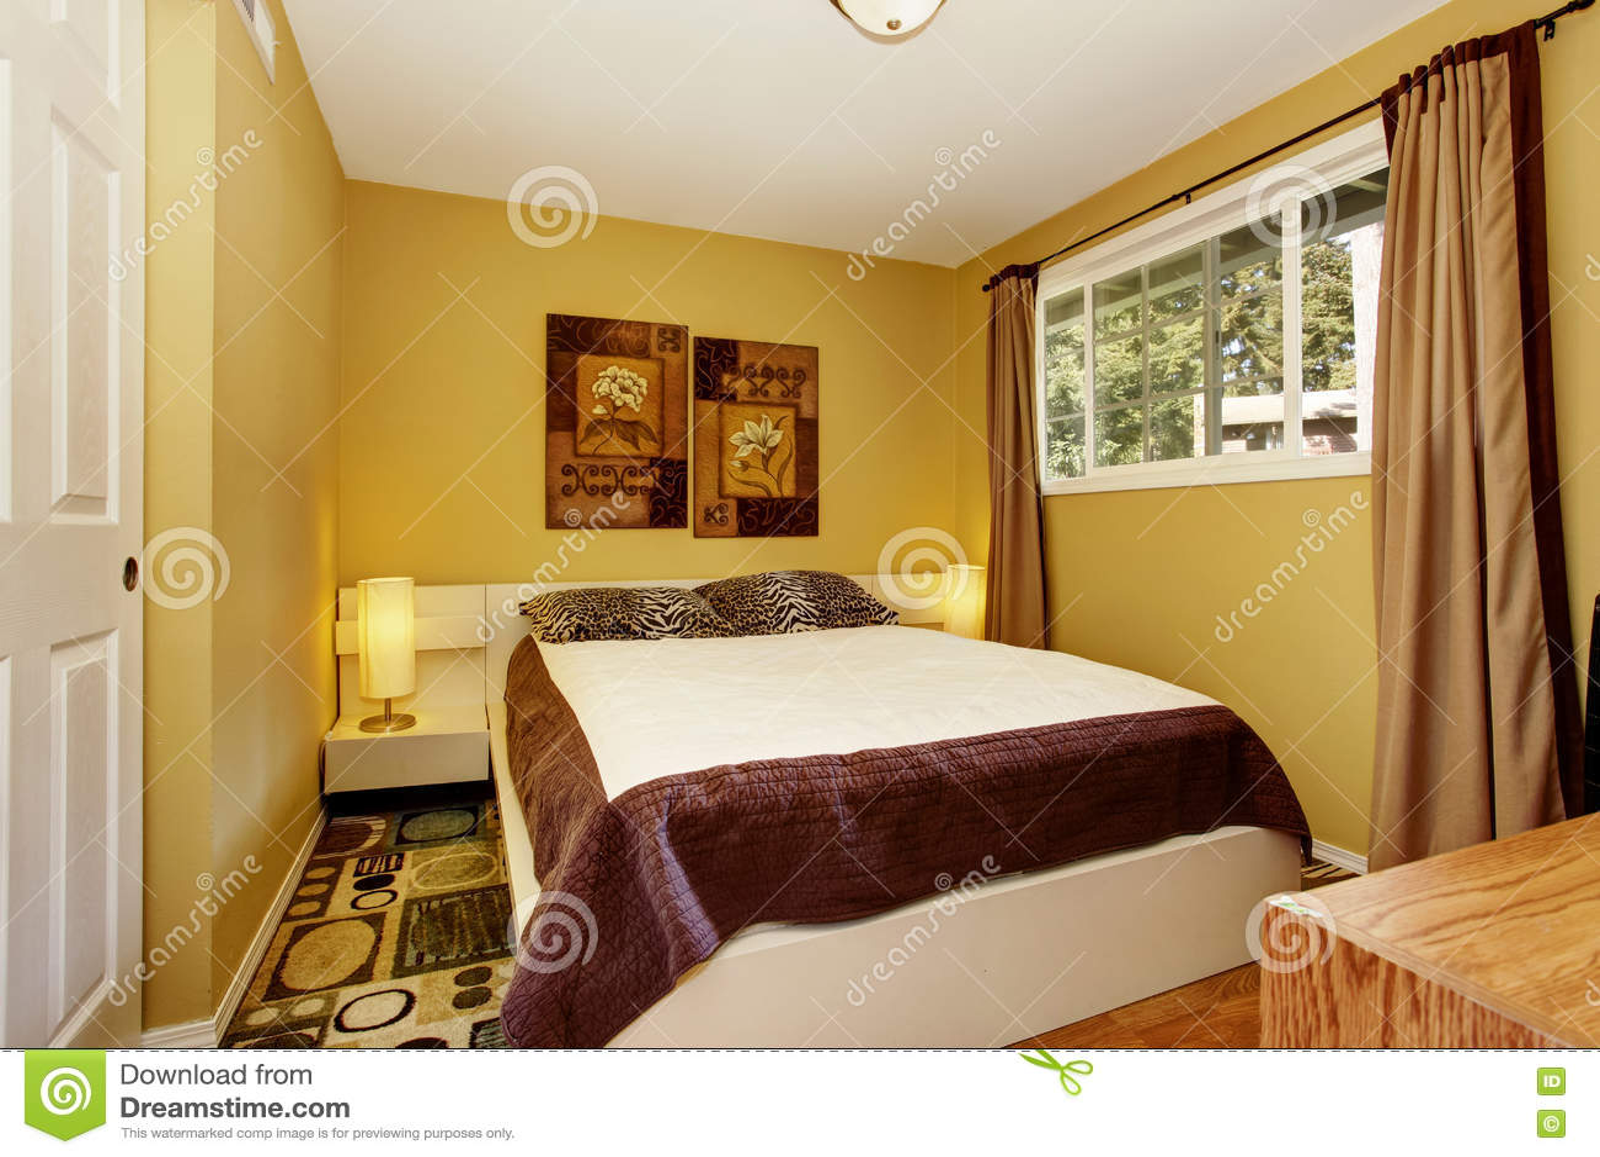 Slaapkamer Bruin Wit : Amerikaanse gele slaapkamer met wit en bruin beddegoed en